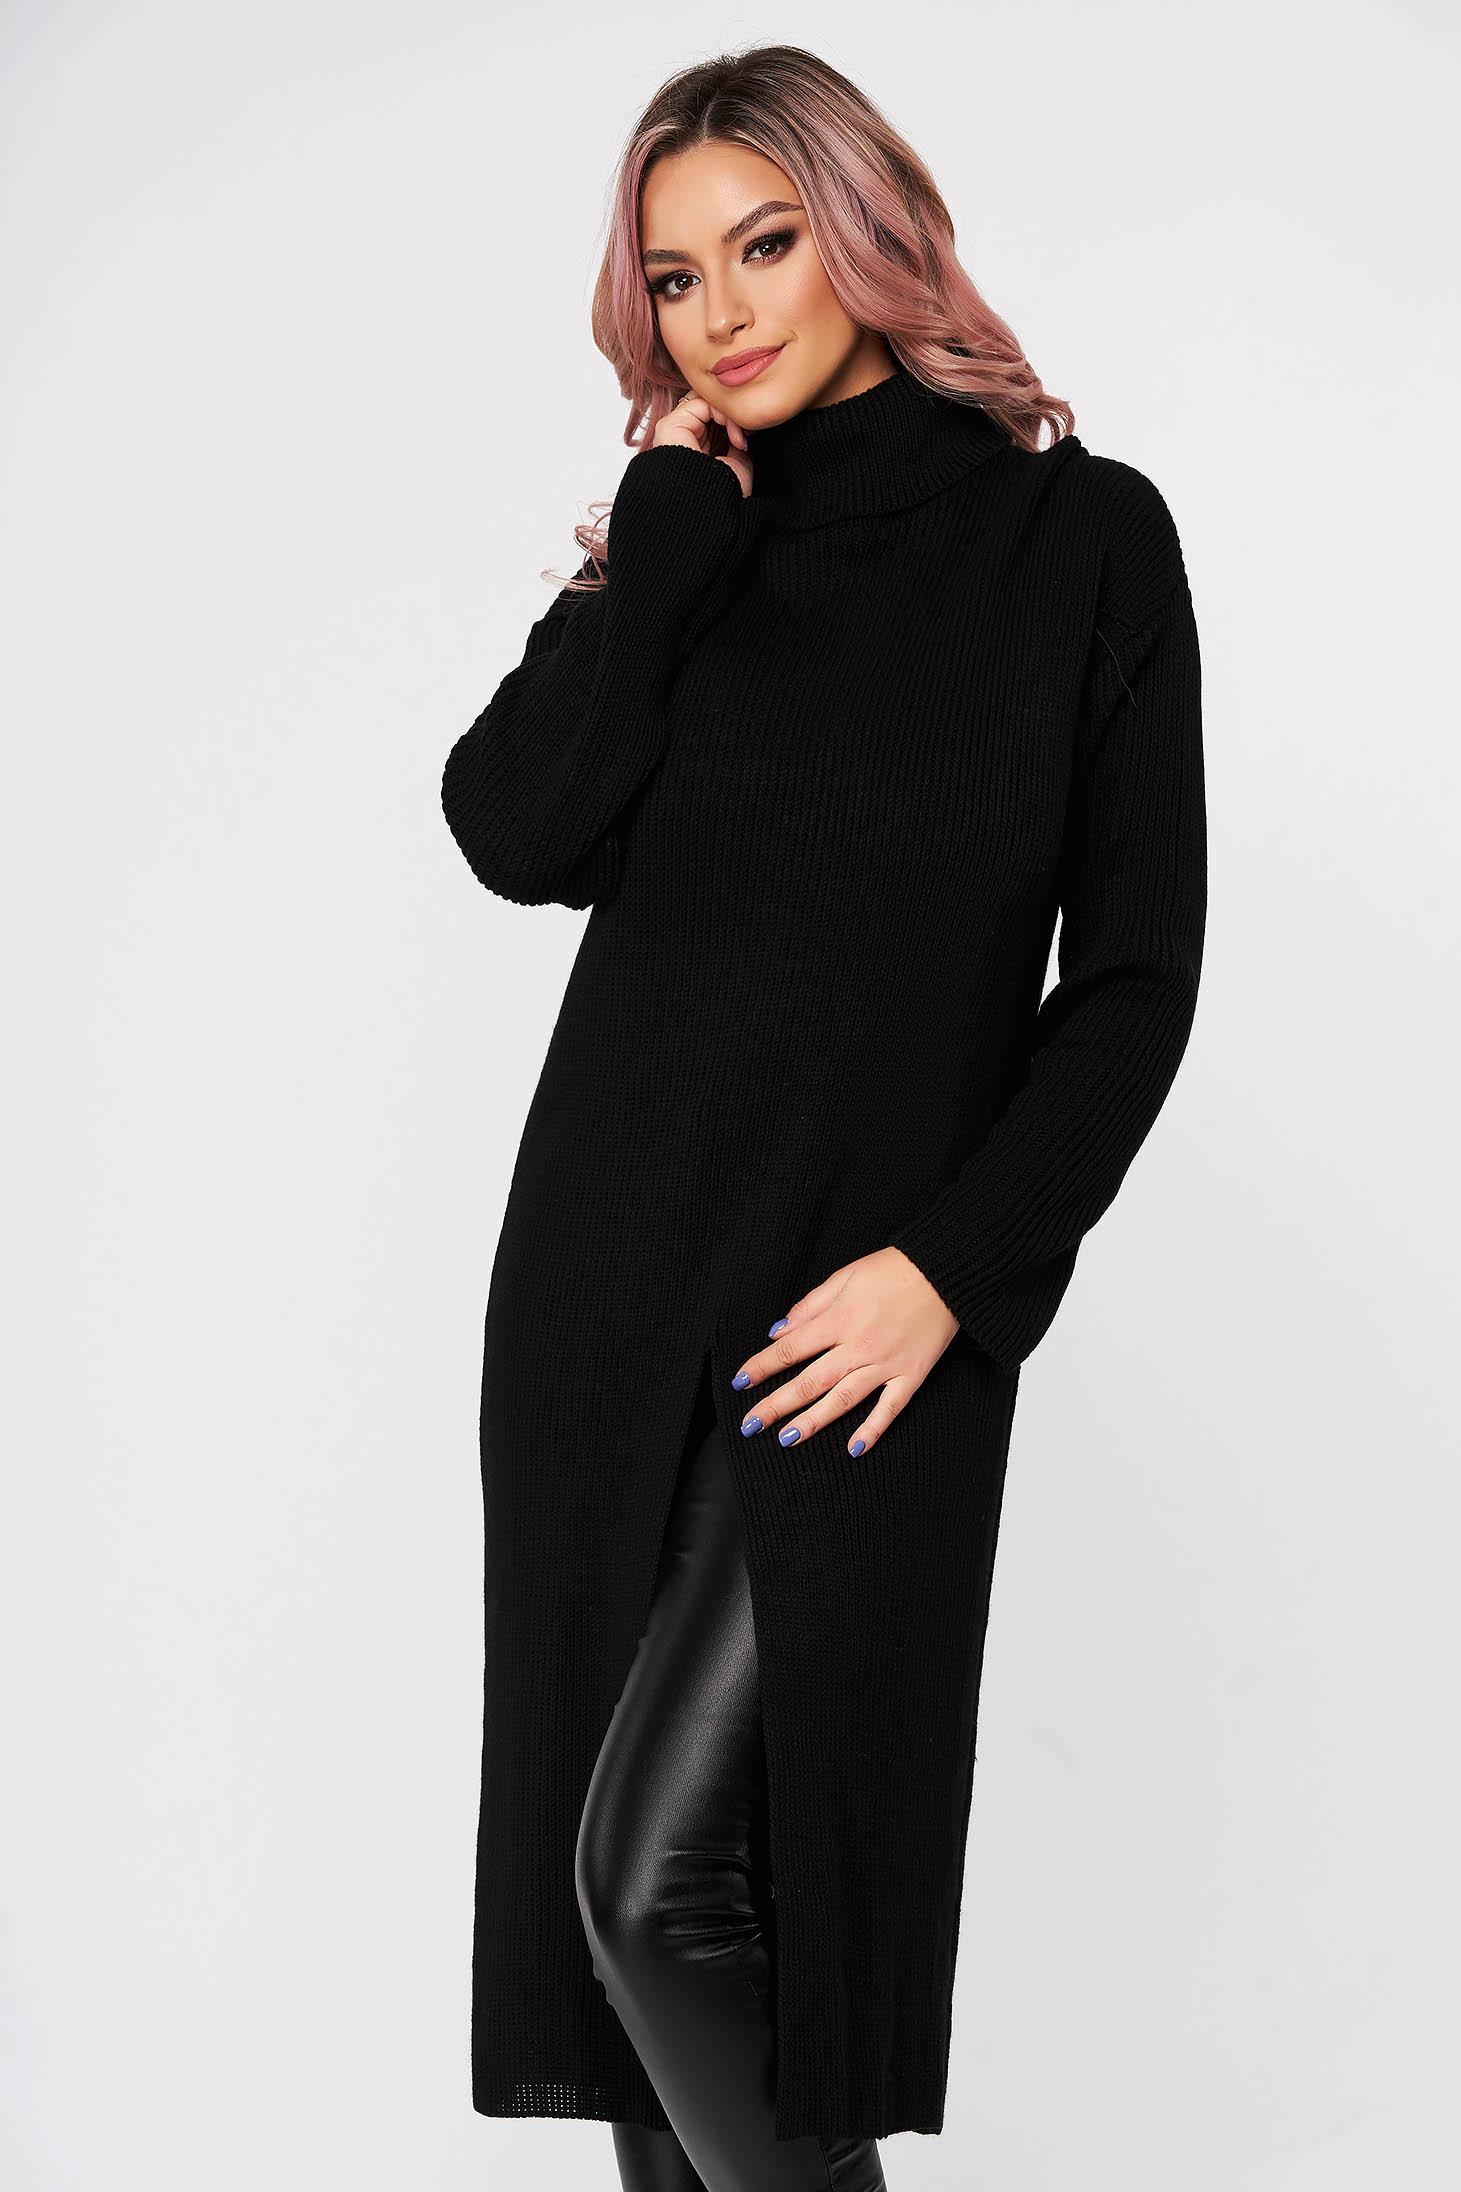 Pulover SunShine negru casual din material tricotat pe gat cu croi larg